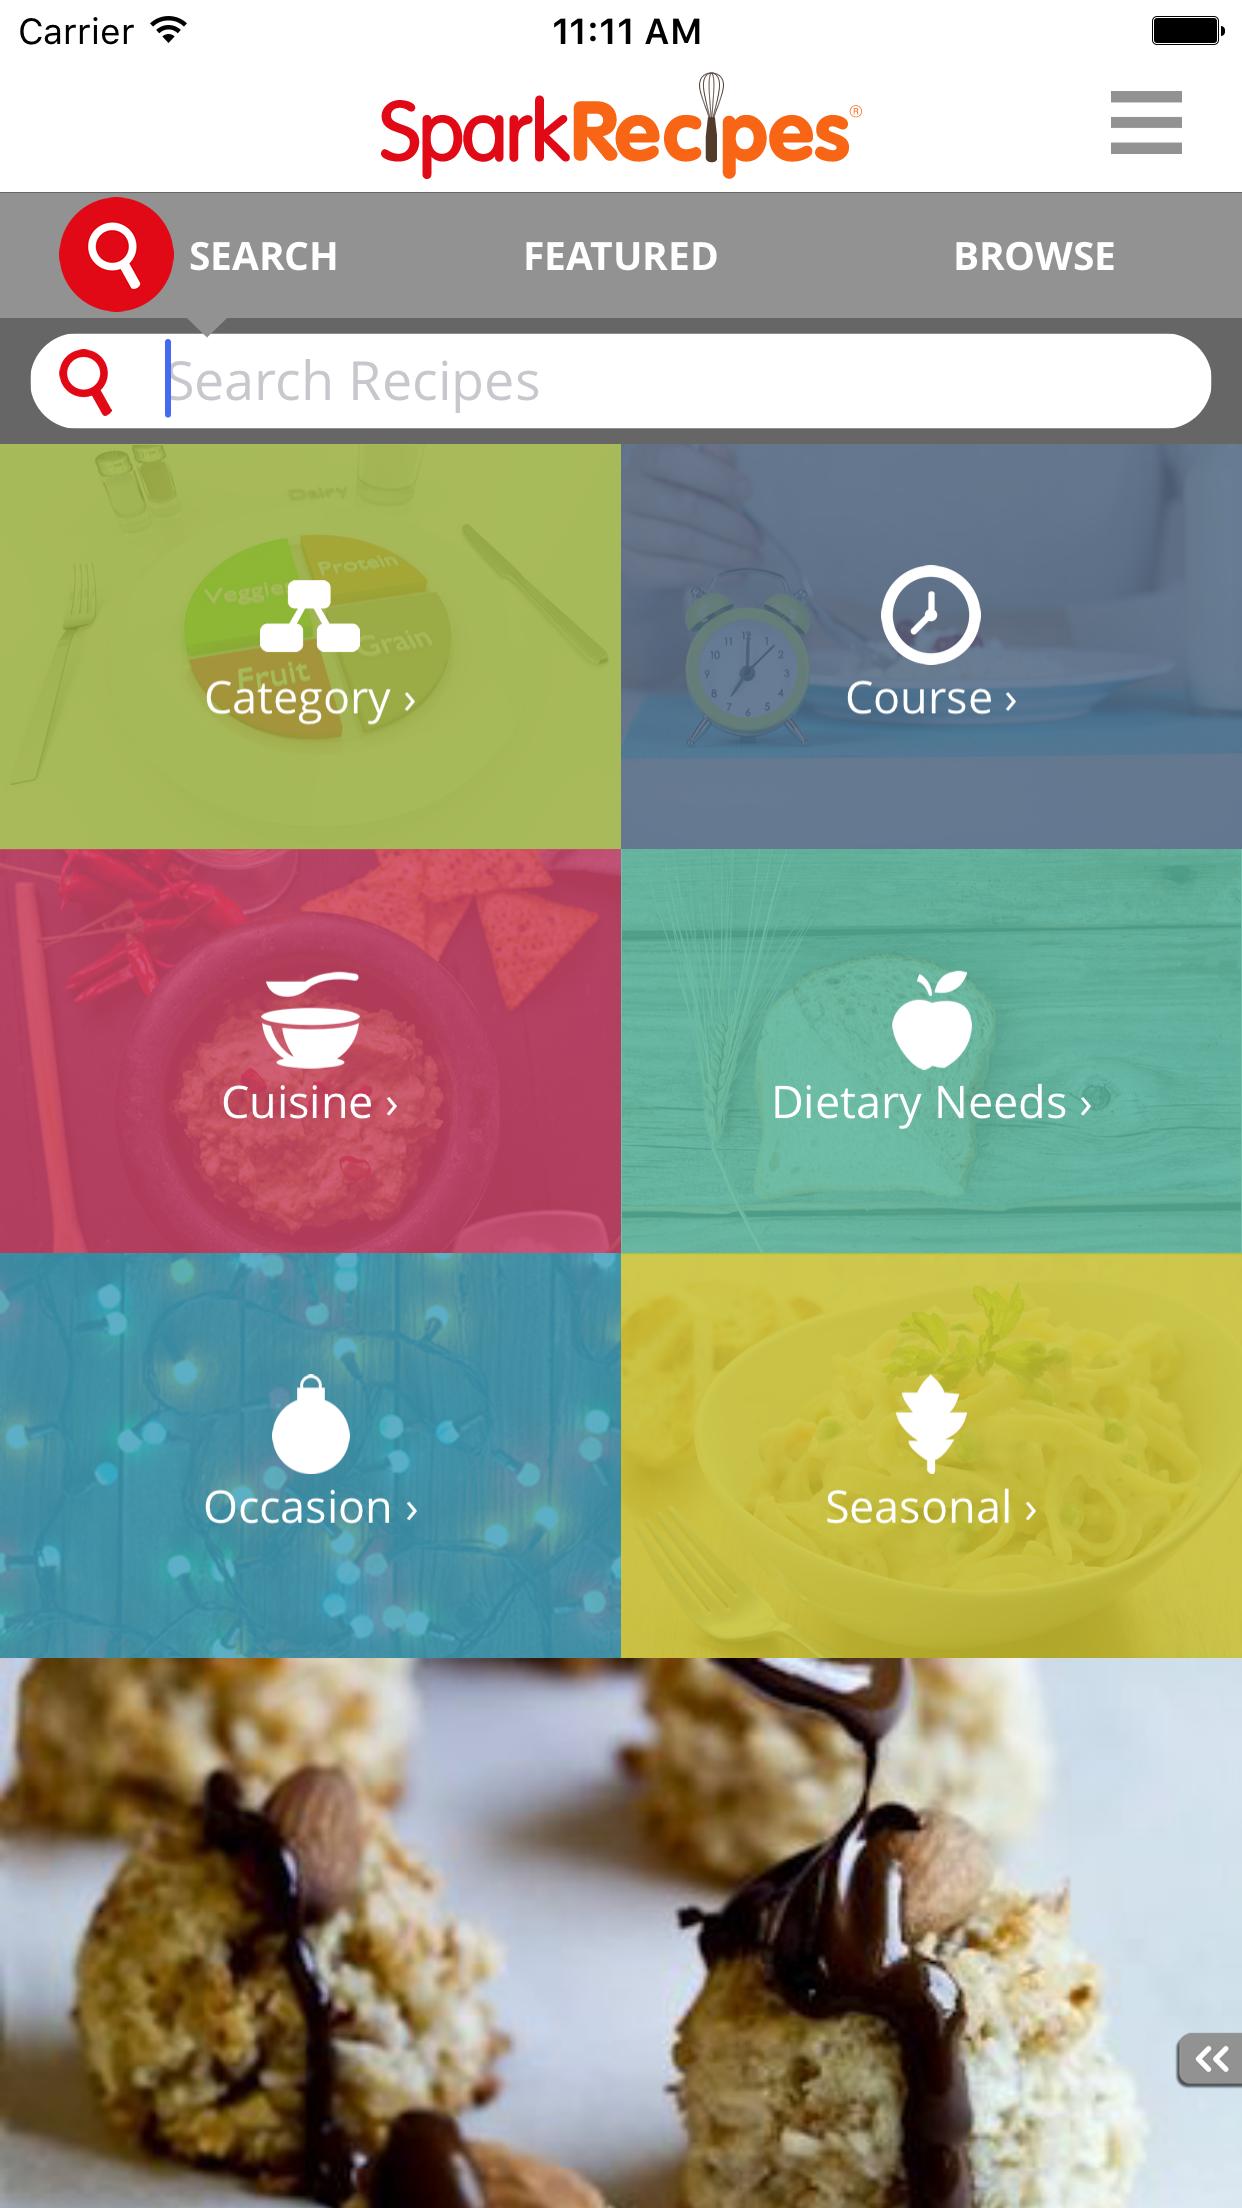 Healthy Recipes - SparkRecipes Screenshot